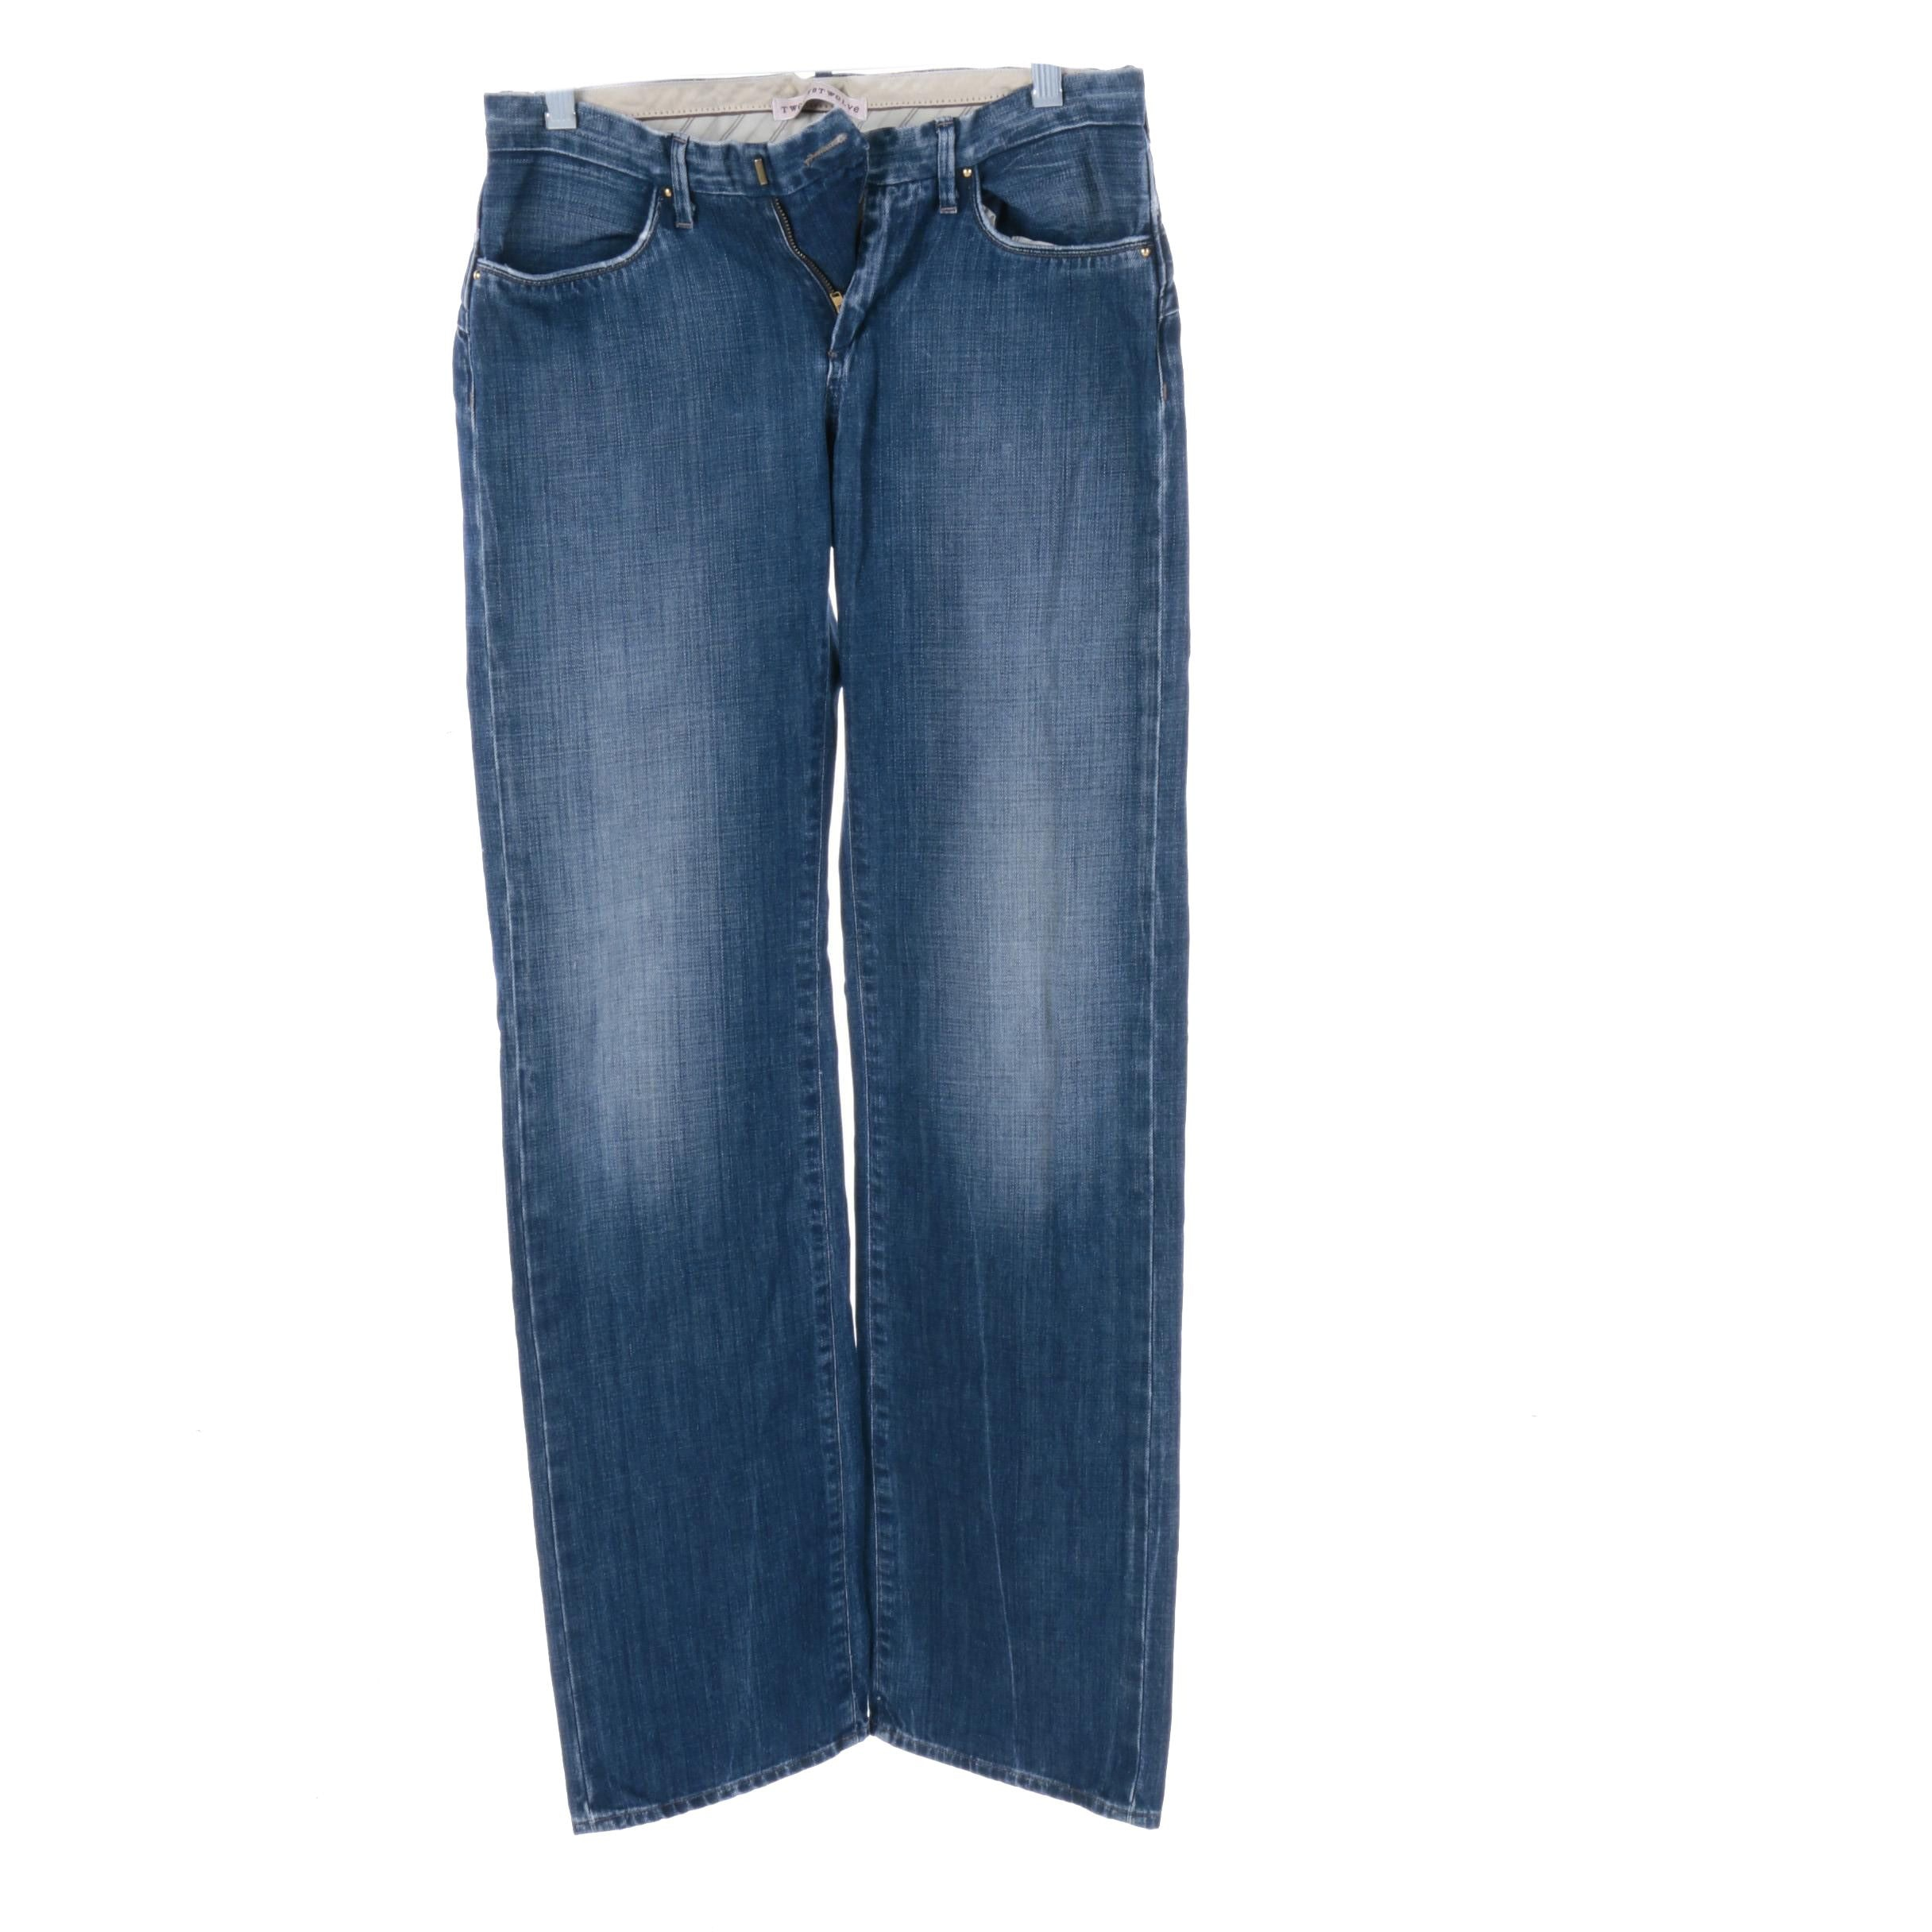 Women's Twenty8Twelve by S.Millerm Jeans